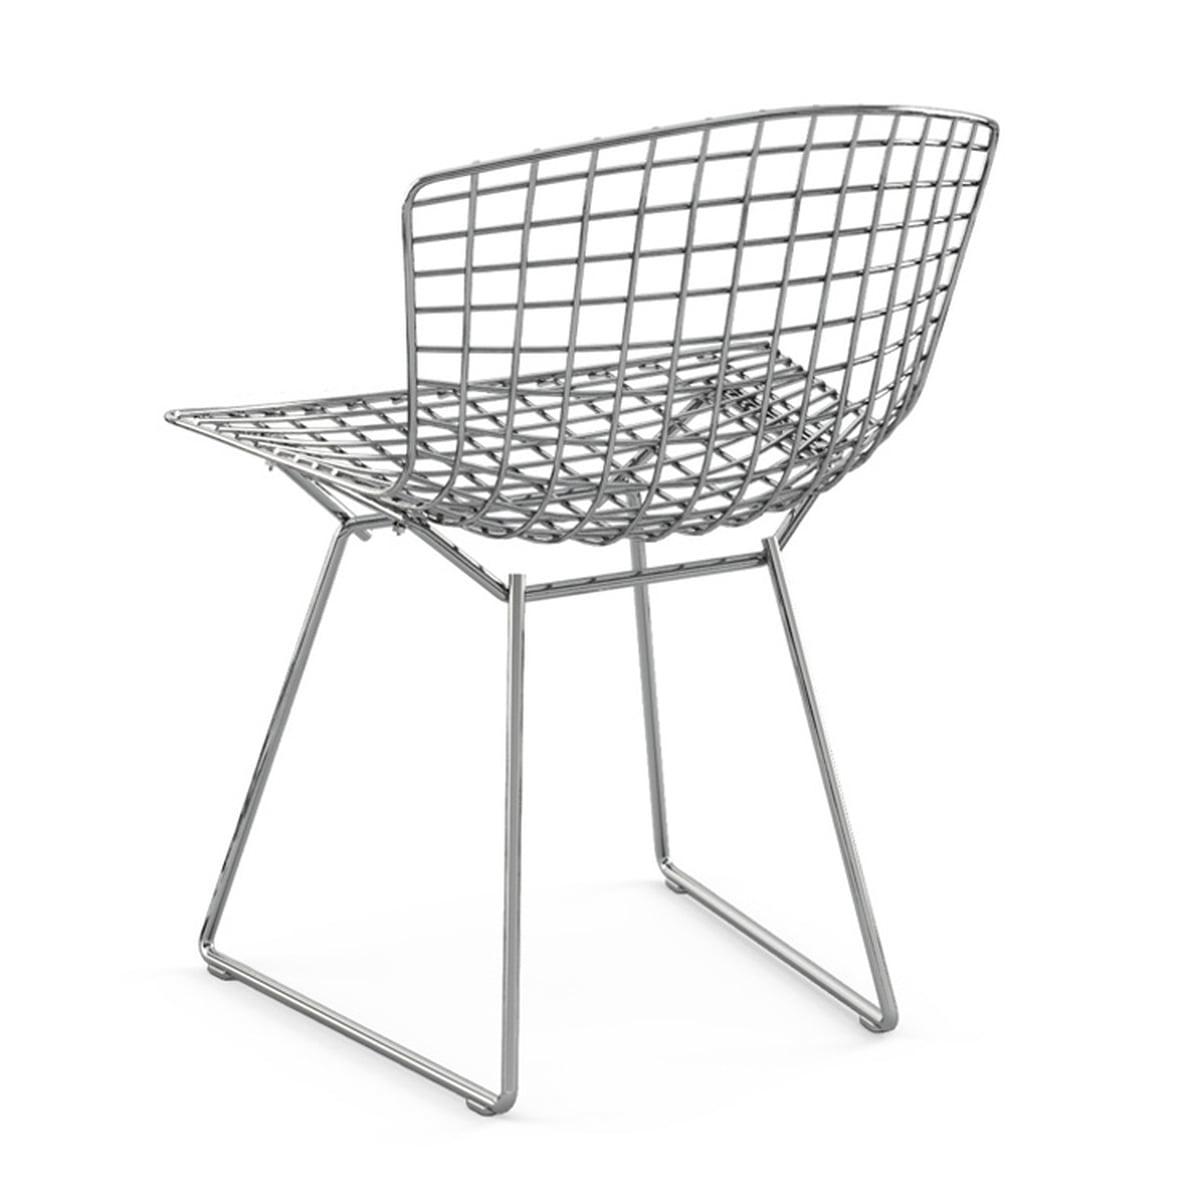 bertoia chaise en fil d acier knoll. Black Bedroom Furniture Sets. Home Design Ideas